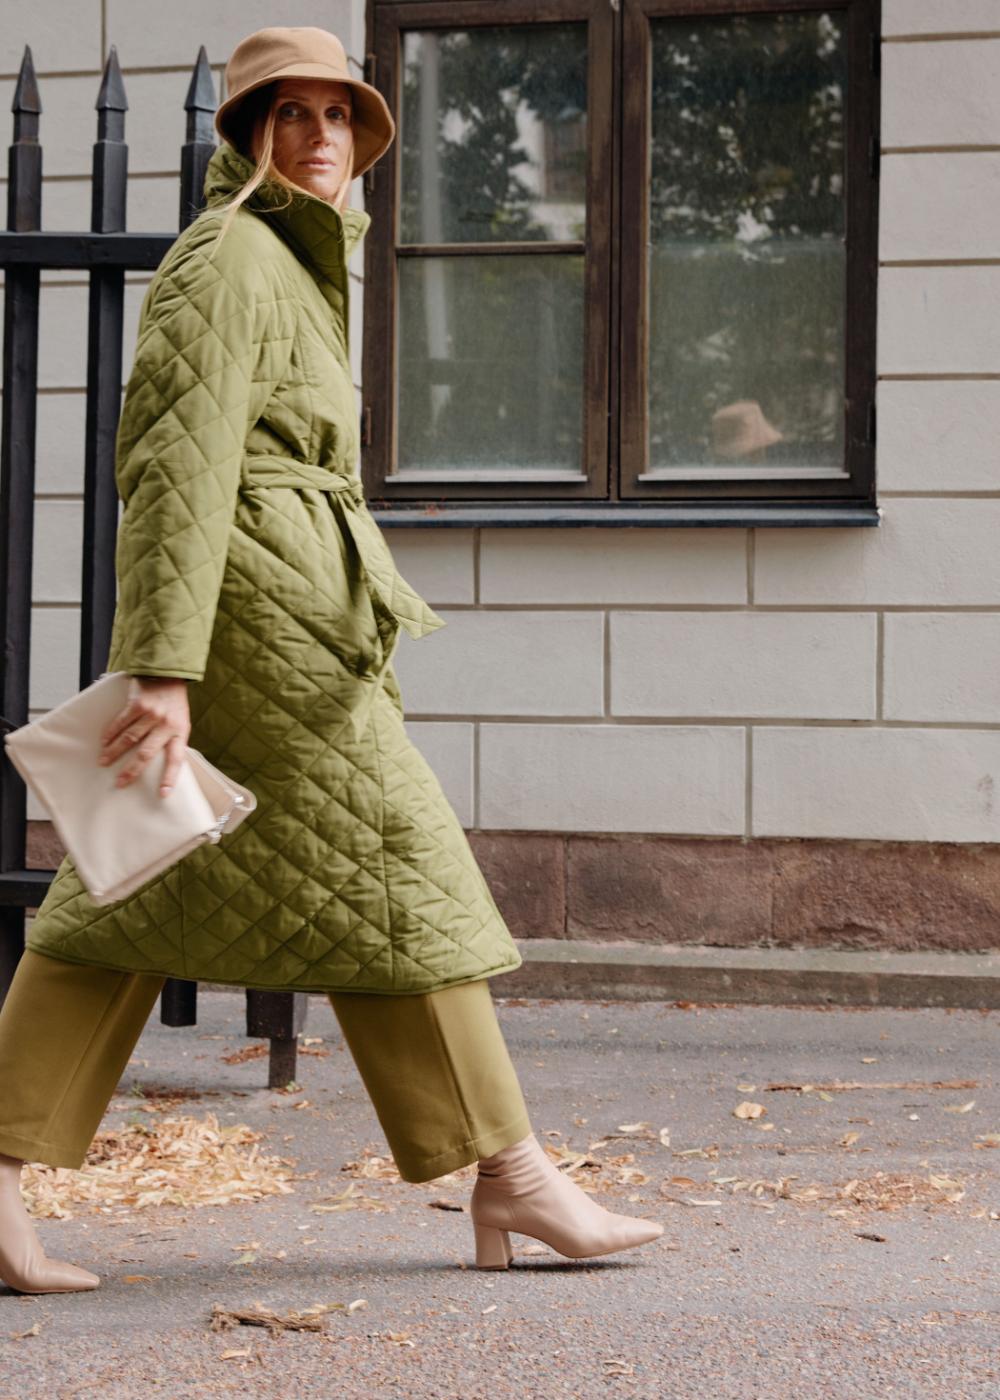 Belted Quilted Coat Quilted Coat Quilted Coat Outfit Coat [ 1400 x 1000 Pixel ]